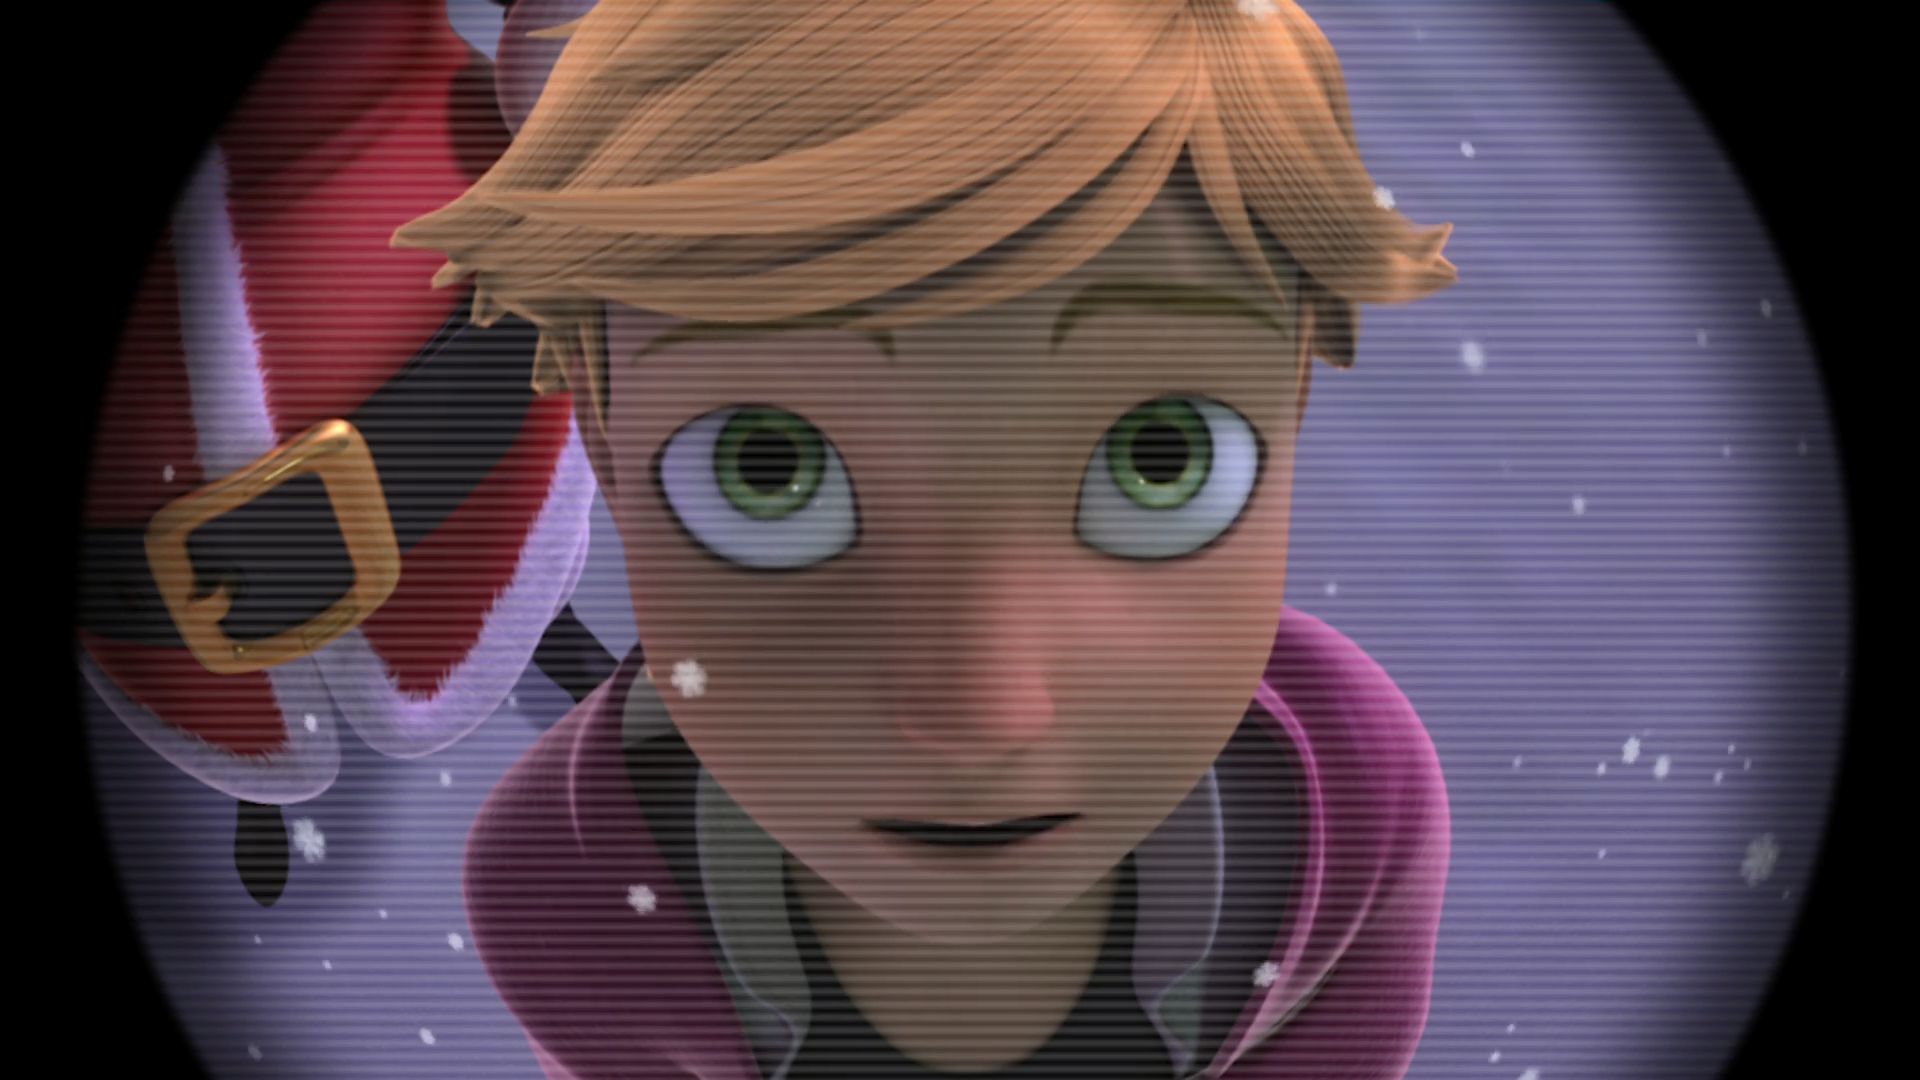 Miraculous Ladybug Christmas Special.The Boy That I Secretly Love Miraculous Ladybug Wiki